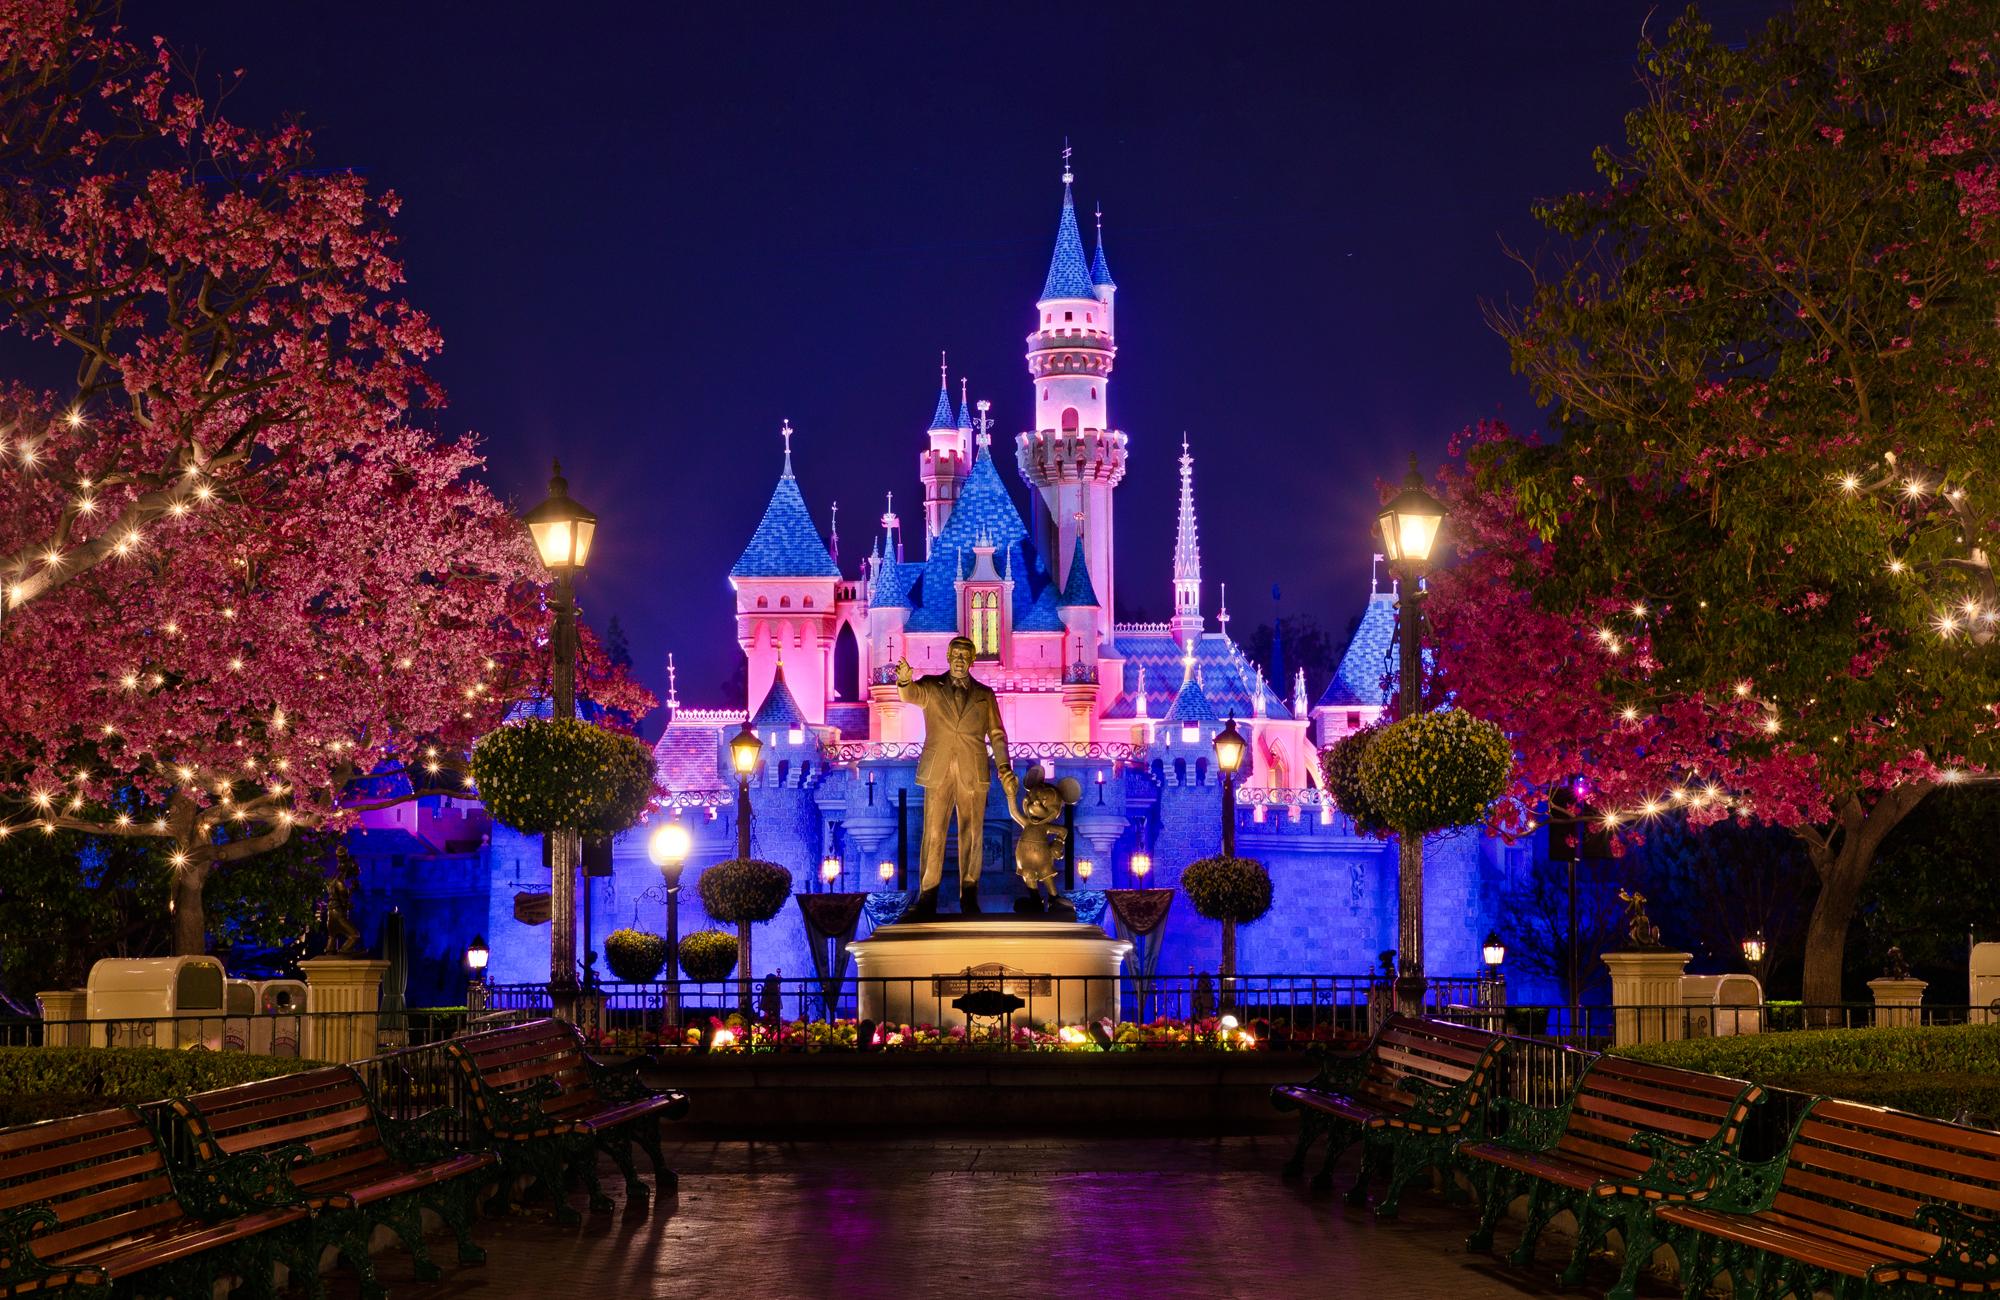 73 Disneyland Wallpaper On Wallpapersafari